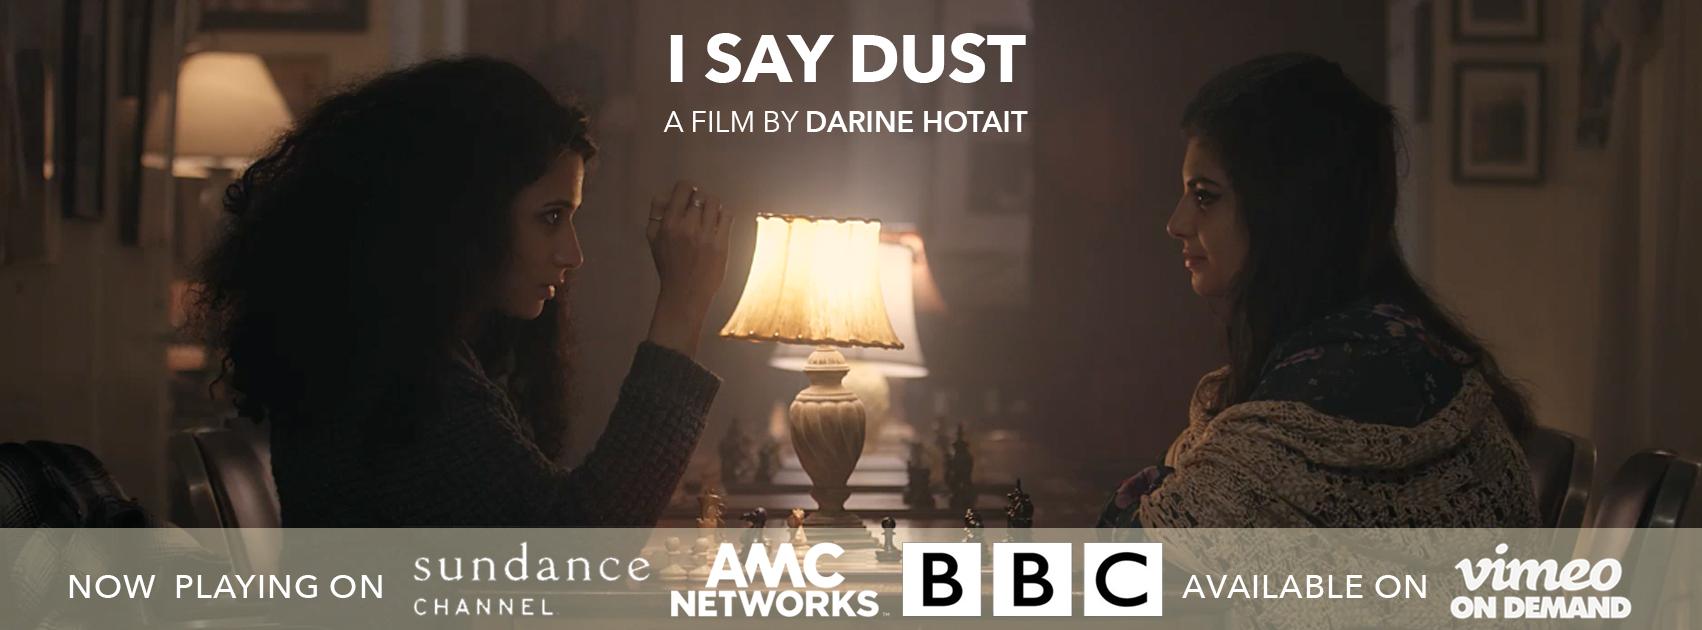 I Say Dust broadcast.jpg